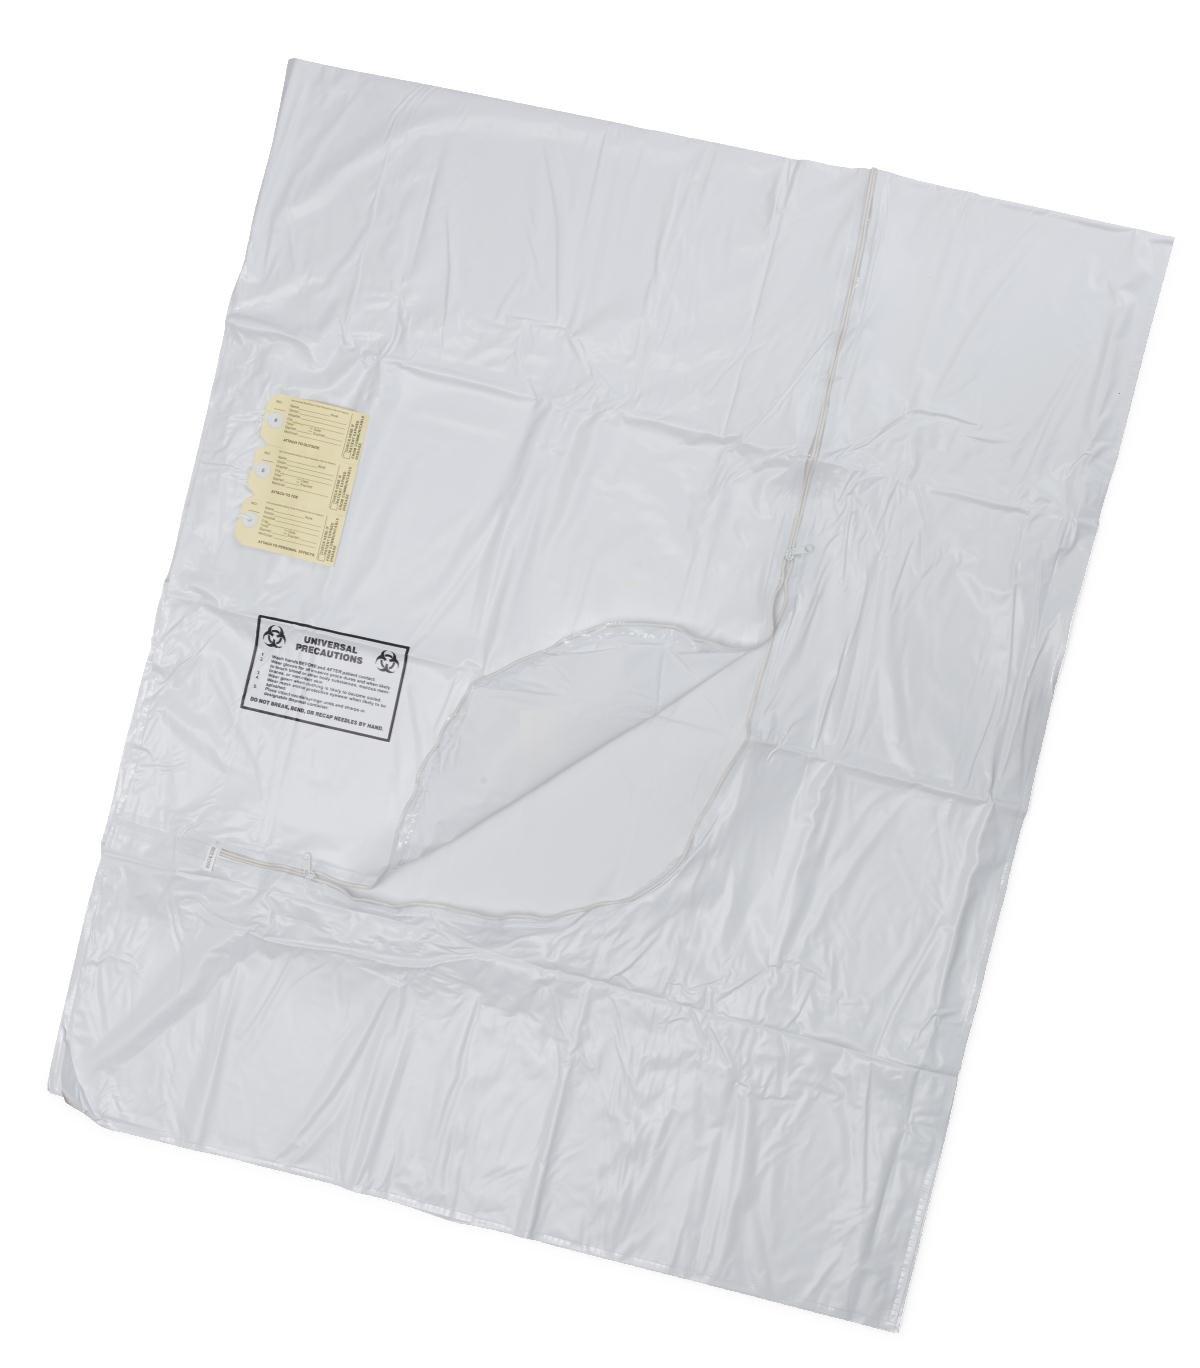 Medline NON70540WM Body Bags, 36'' x 90'', Adult, White (Pack of 10)